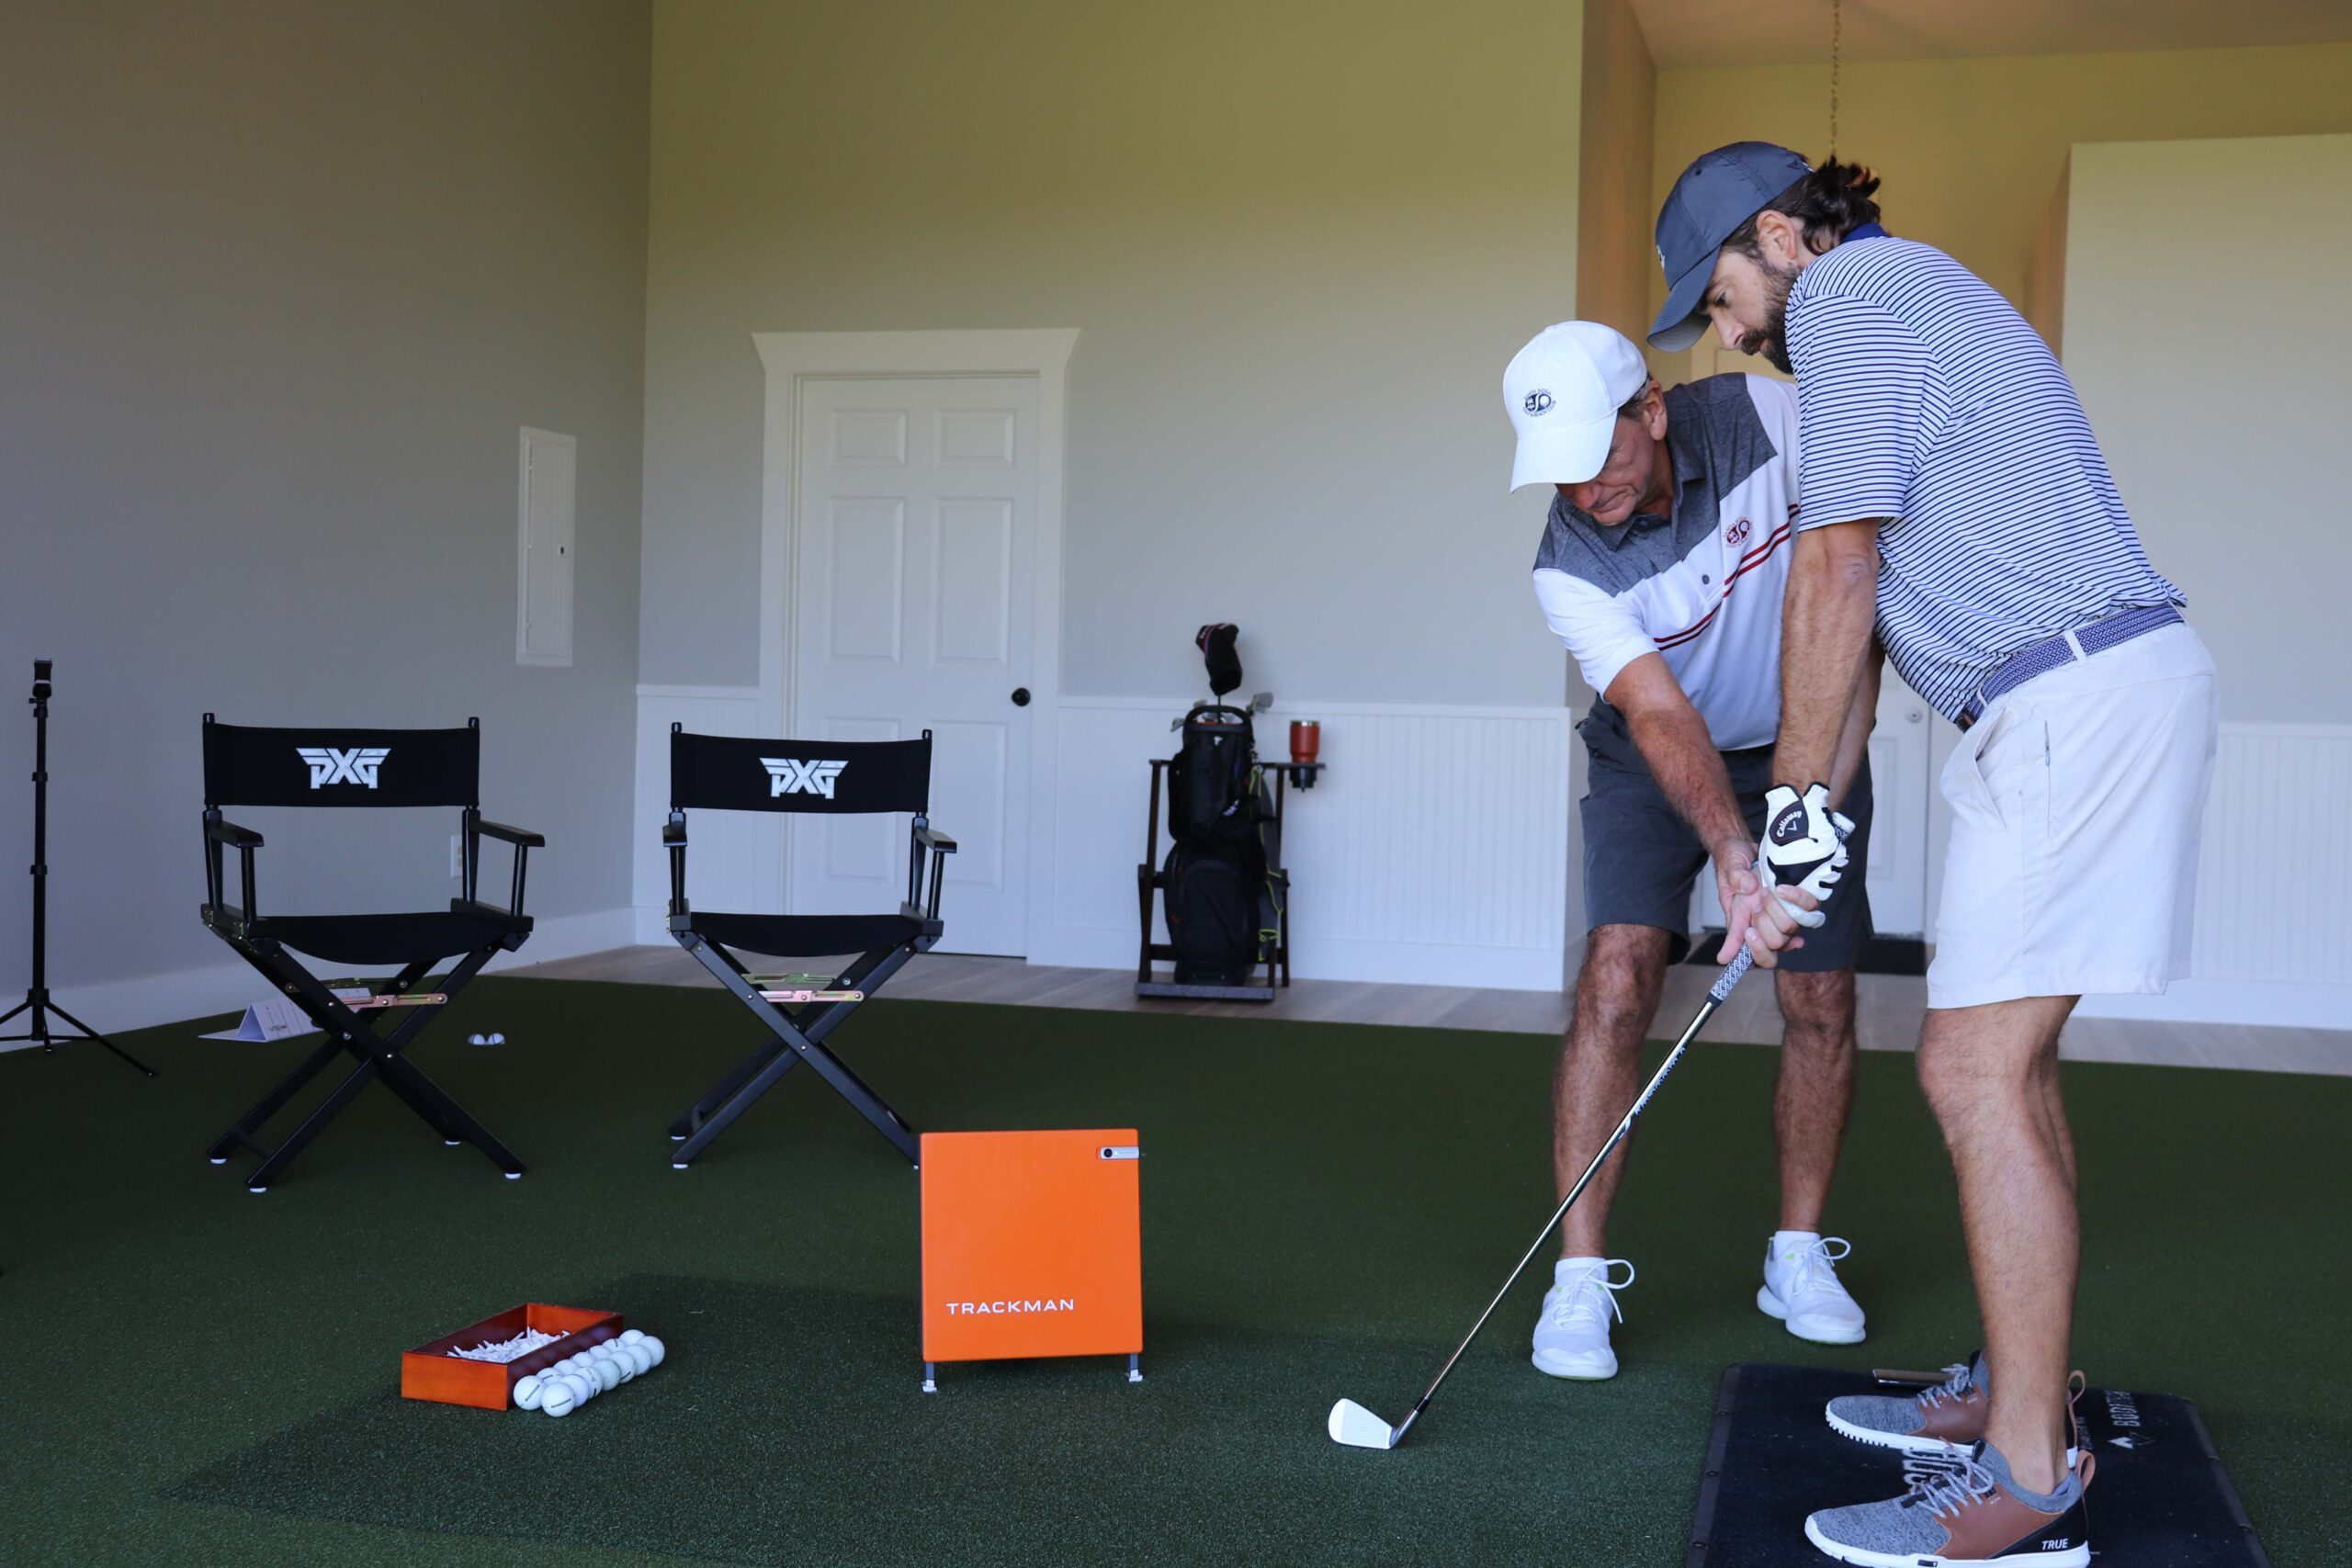 Santa Rosa Golf & Beach Club builds golf instruction facility with cutting-edge golf technology